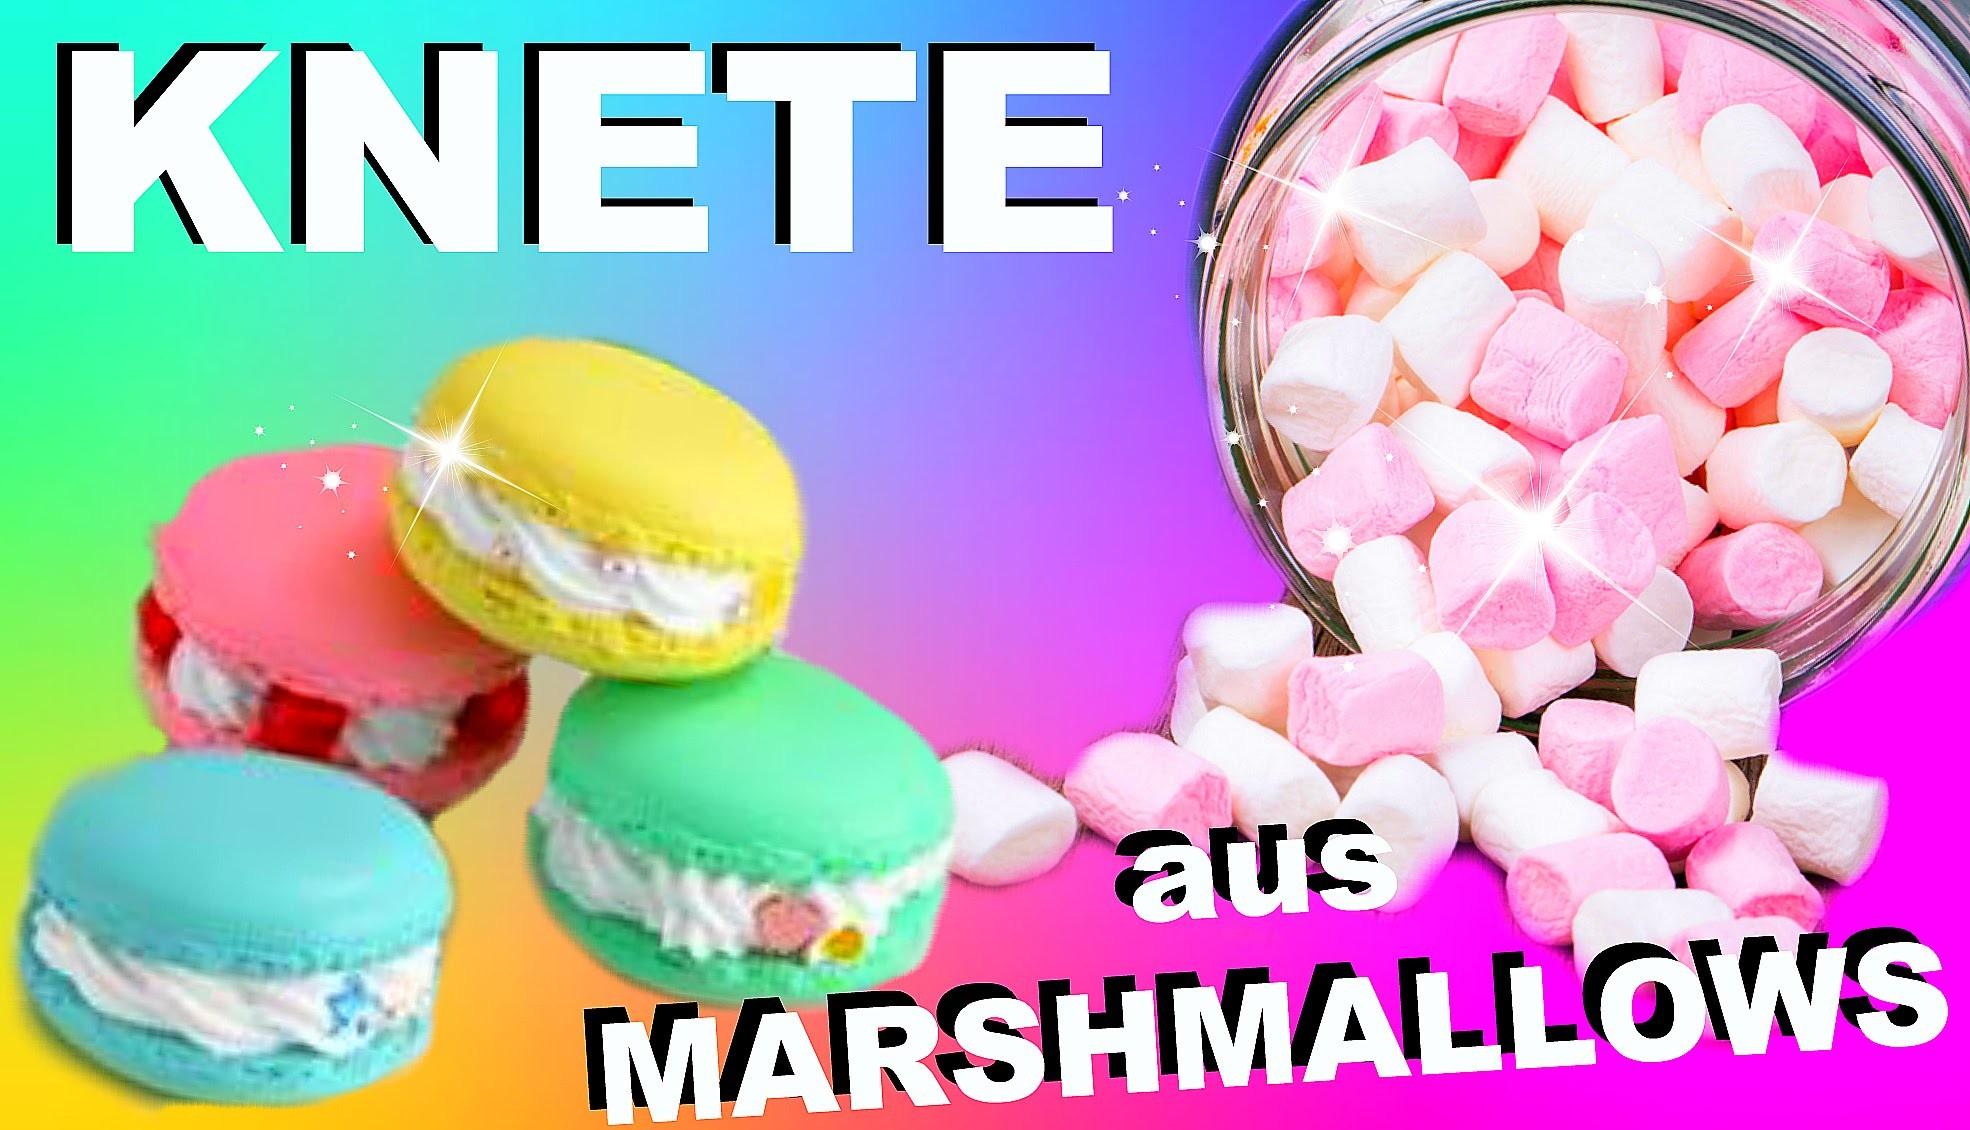 Diy Essbare Knete Aus Marshmallows Selber Machen I Diy Edible Play